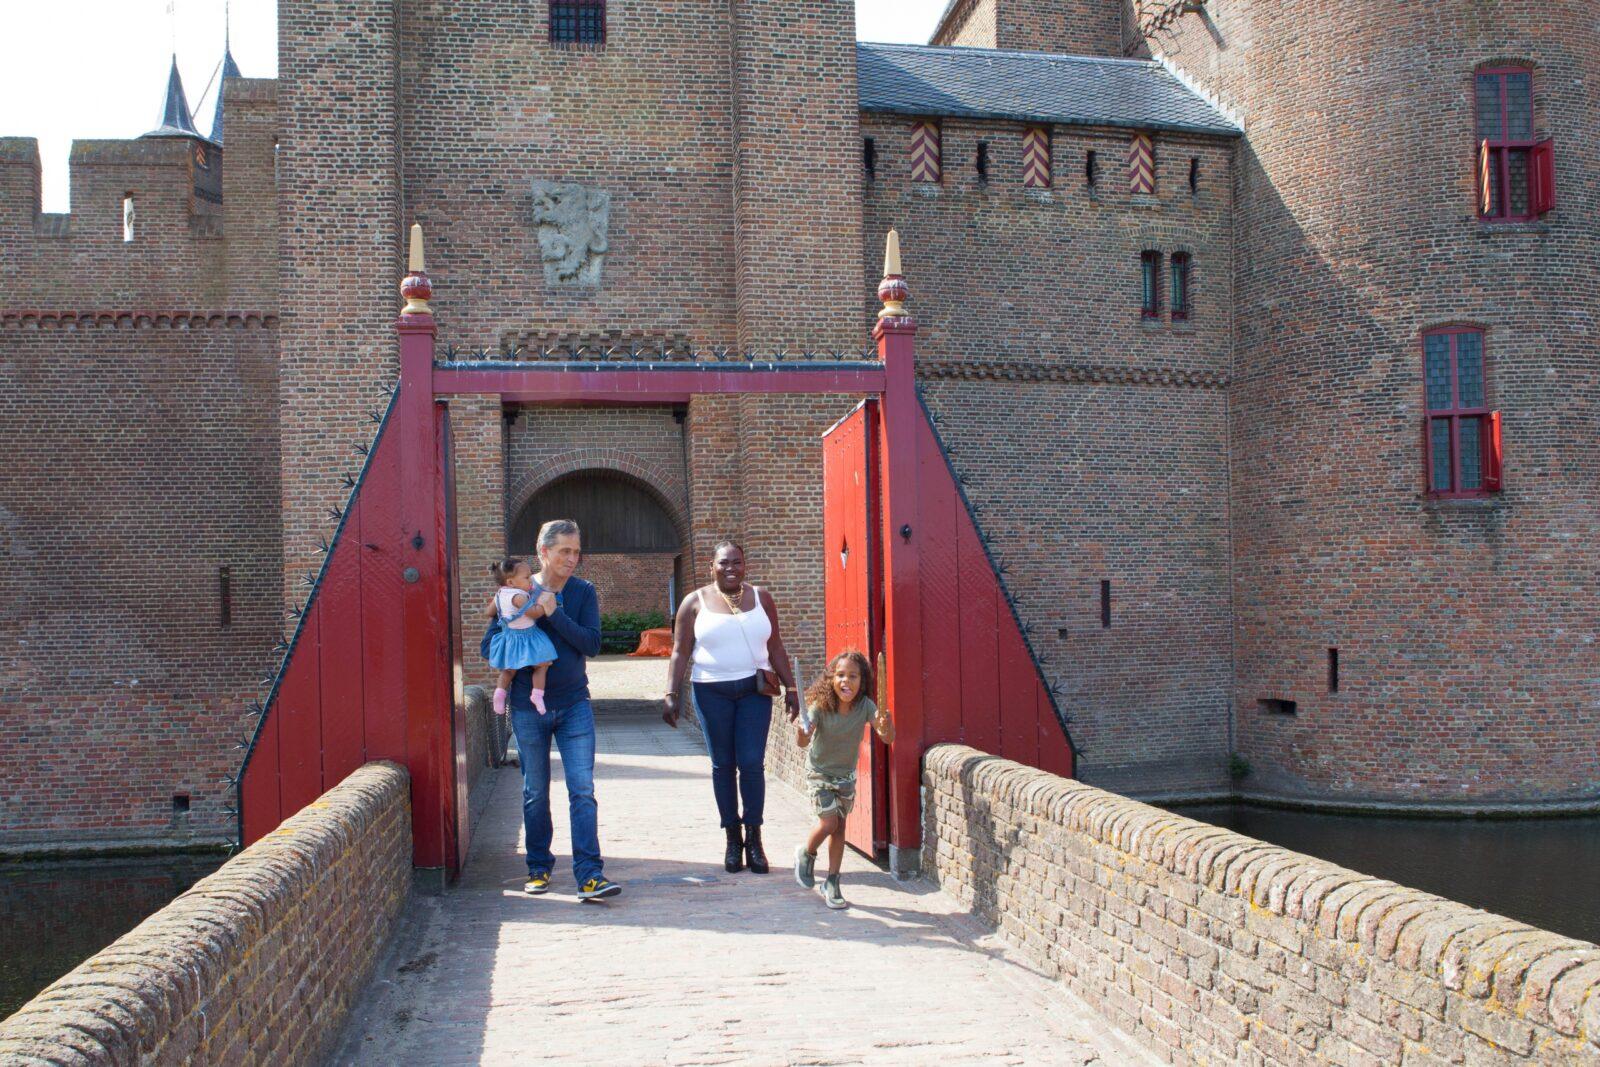 Family fun at Muiderslot Castle